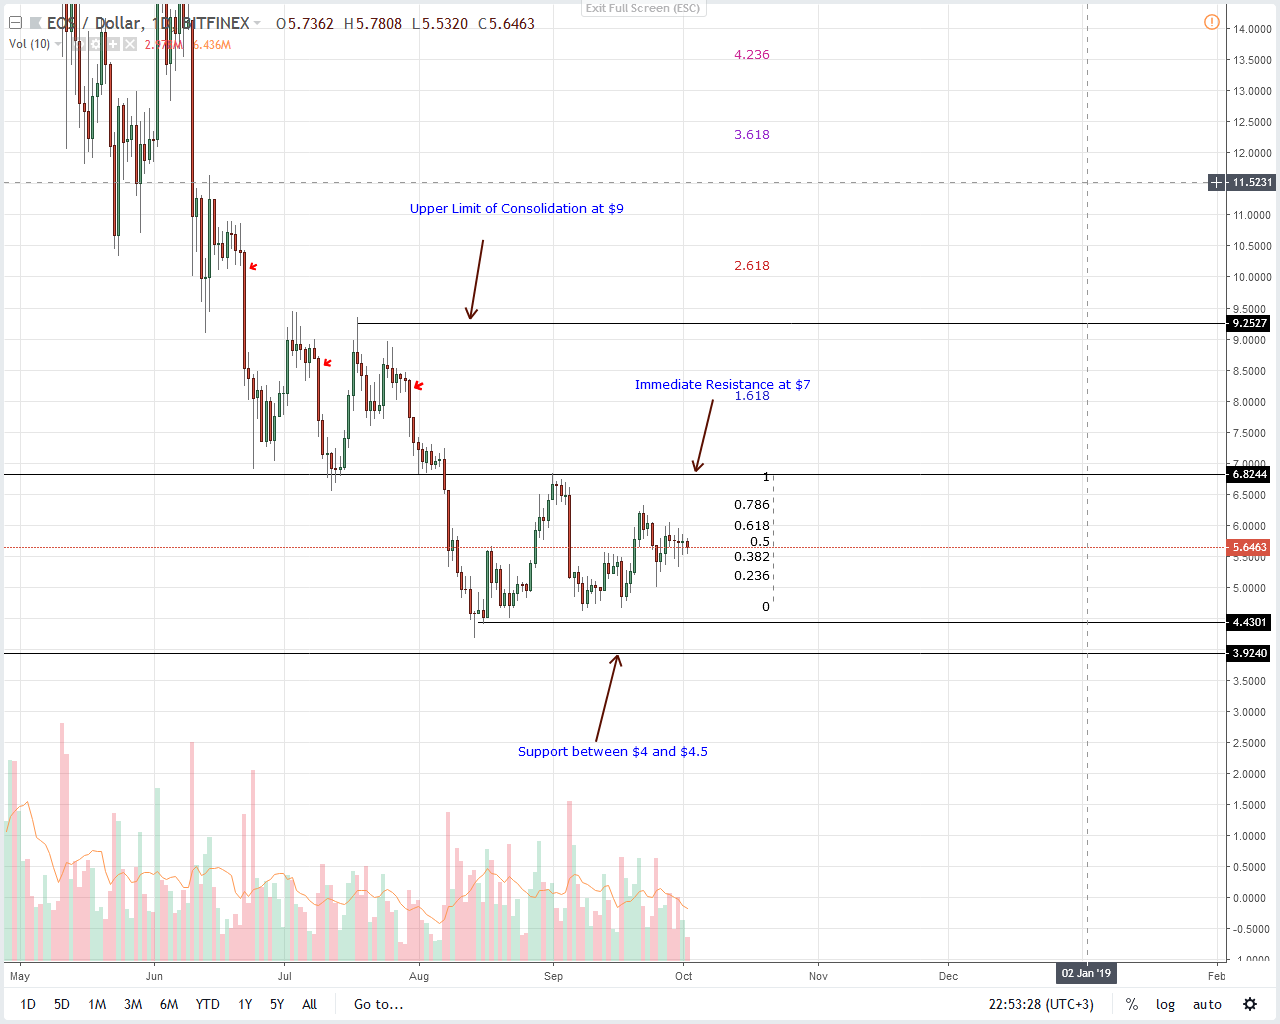 Cardano Price Analysis: Stellar Lumens and Litecoin Stabilizing the